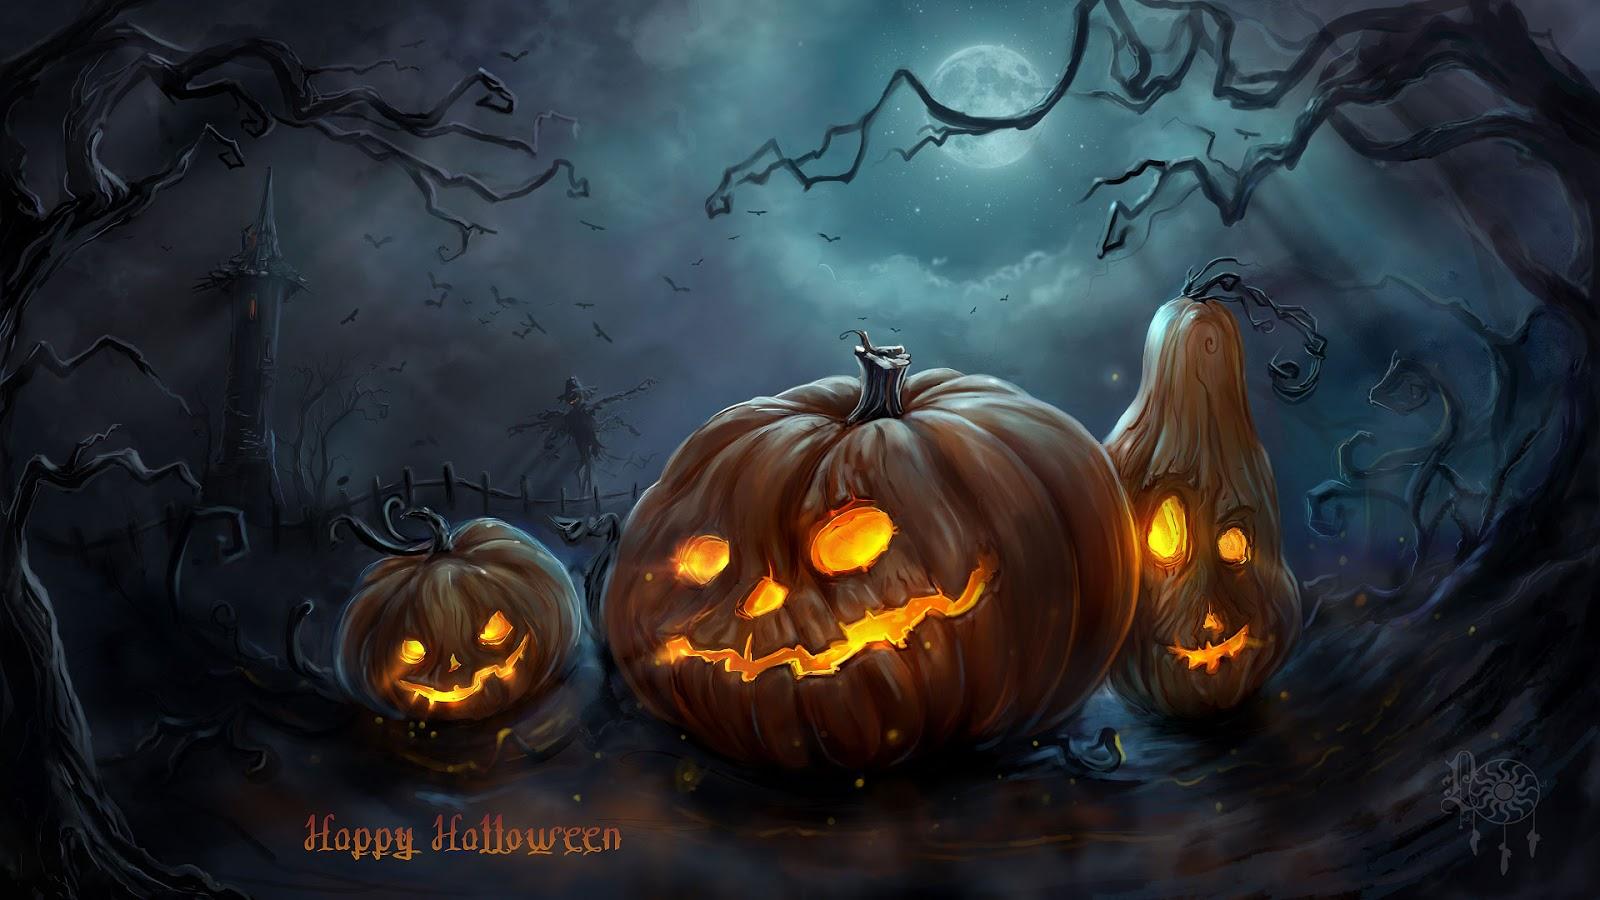 happy halloween animated images - Happy Halloween Com